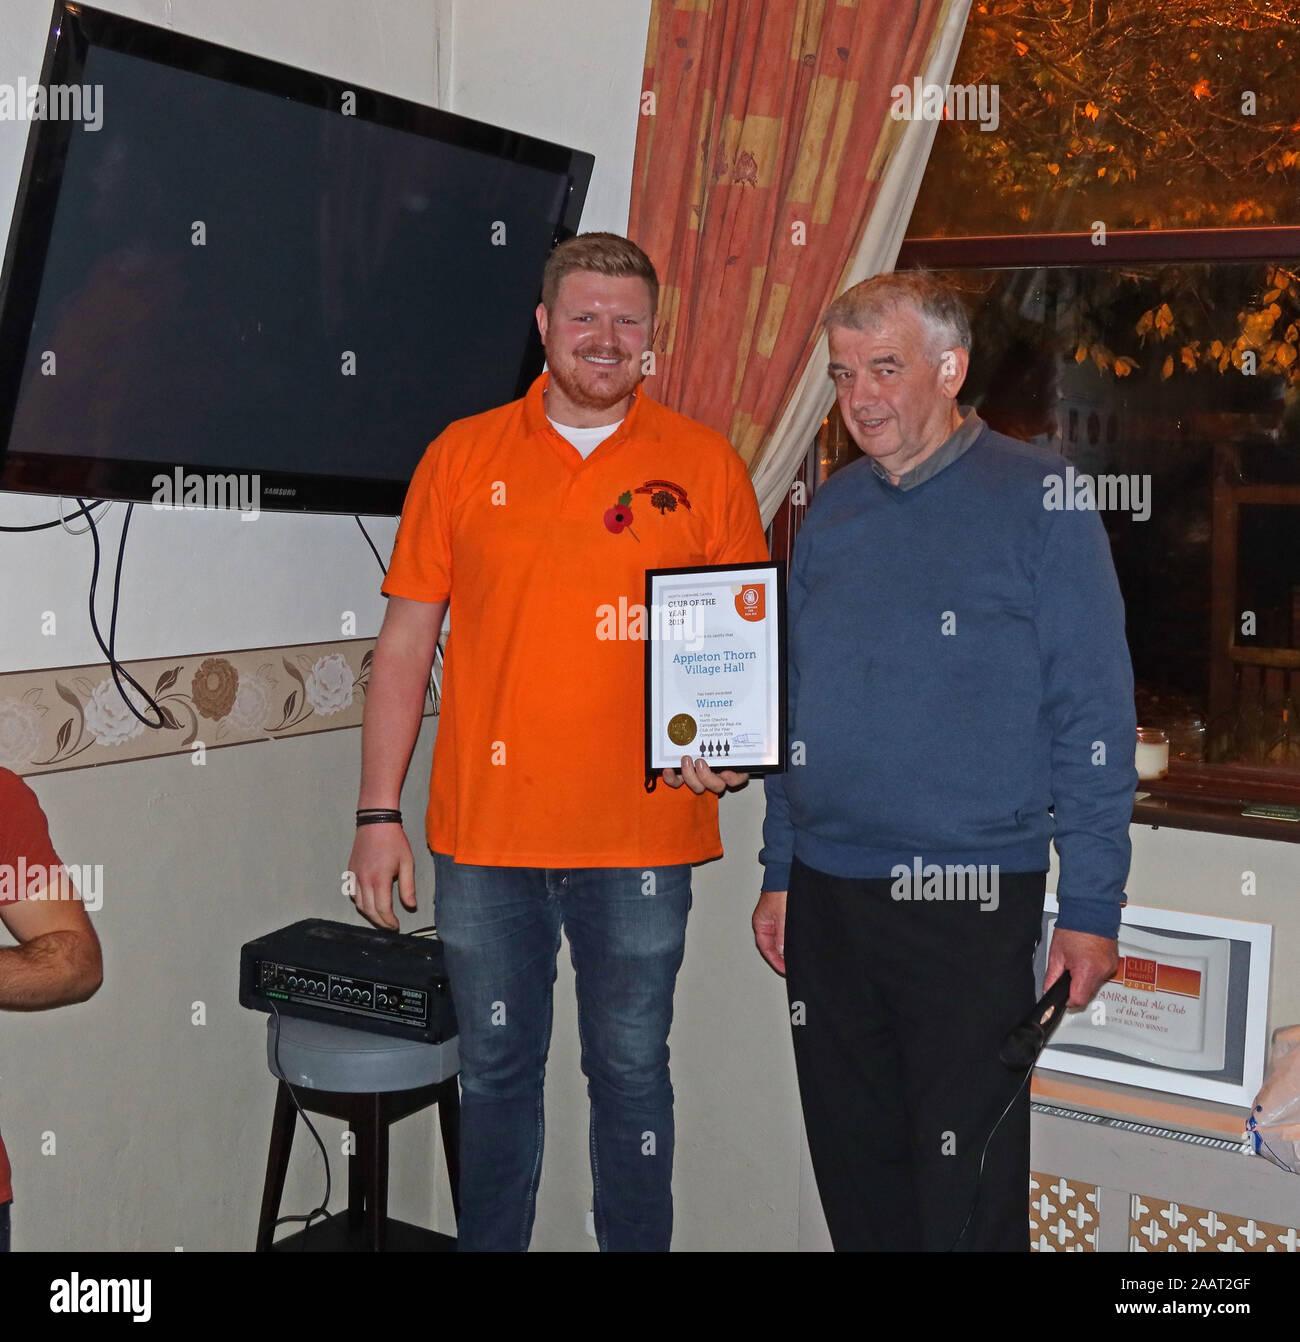 HotpixUk,@HotpixUK,GoTonySmith,UK,England,English,Appleton,CAMRA National Club of the Year 2019,National Club of the Year,2019,Warrington,Cheshire,WA4 4RT,local beer festival,village beer festival,awarded,awards,real ale,bitters,IPA,Chris Massey,Steward,receives award,receives,presented,club of the year award,certificate,01/11/2019,1st November 2019,Friday,posing with award,presented with award